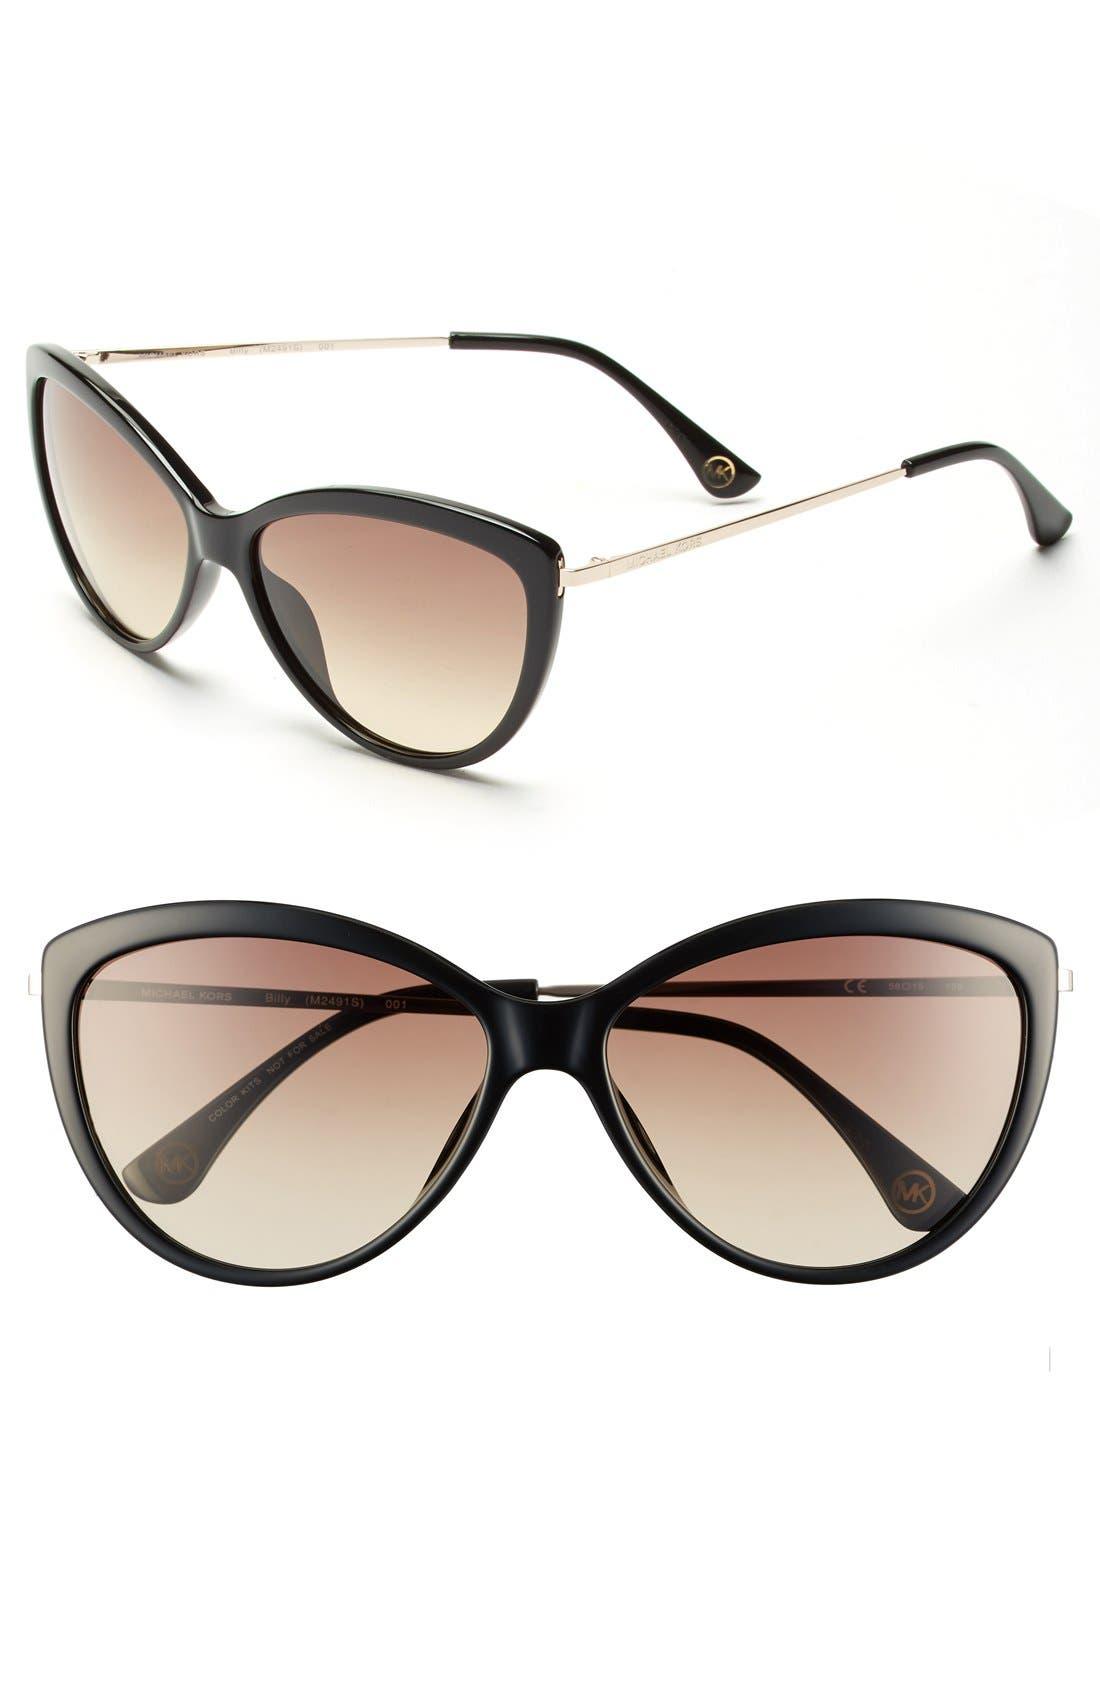 58mm Cat Eye Sunglasses,                             Main thumbnail 1, color,                             001